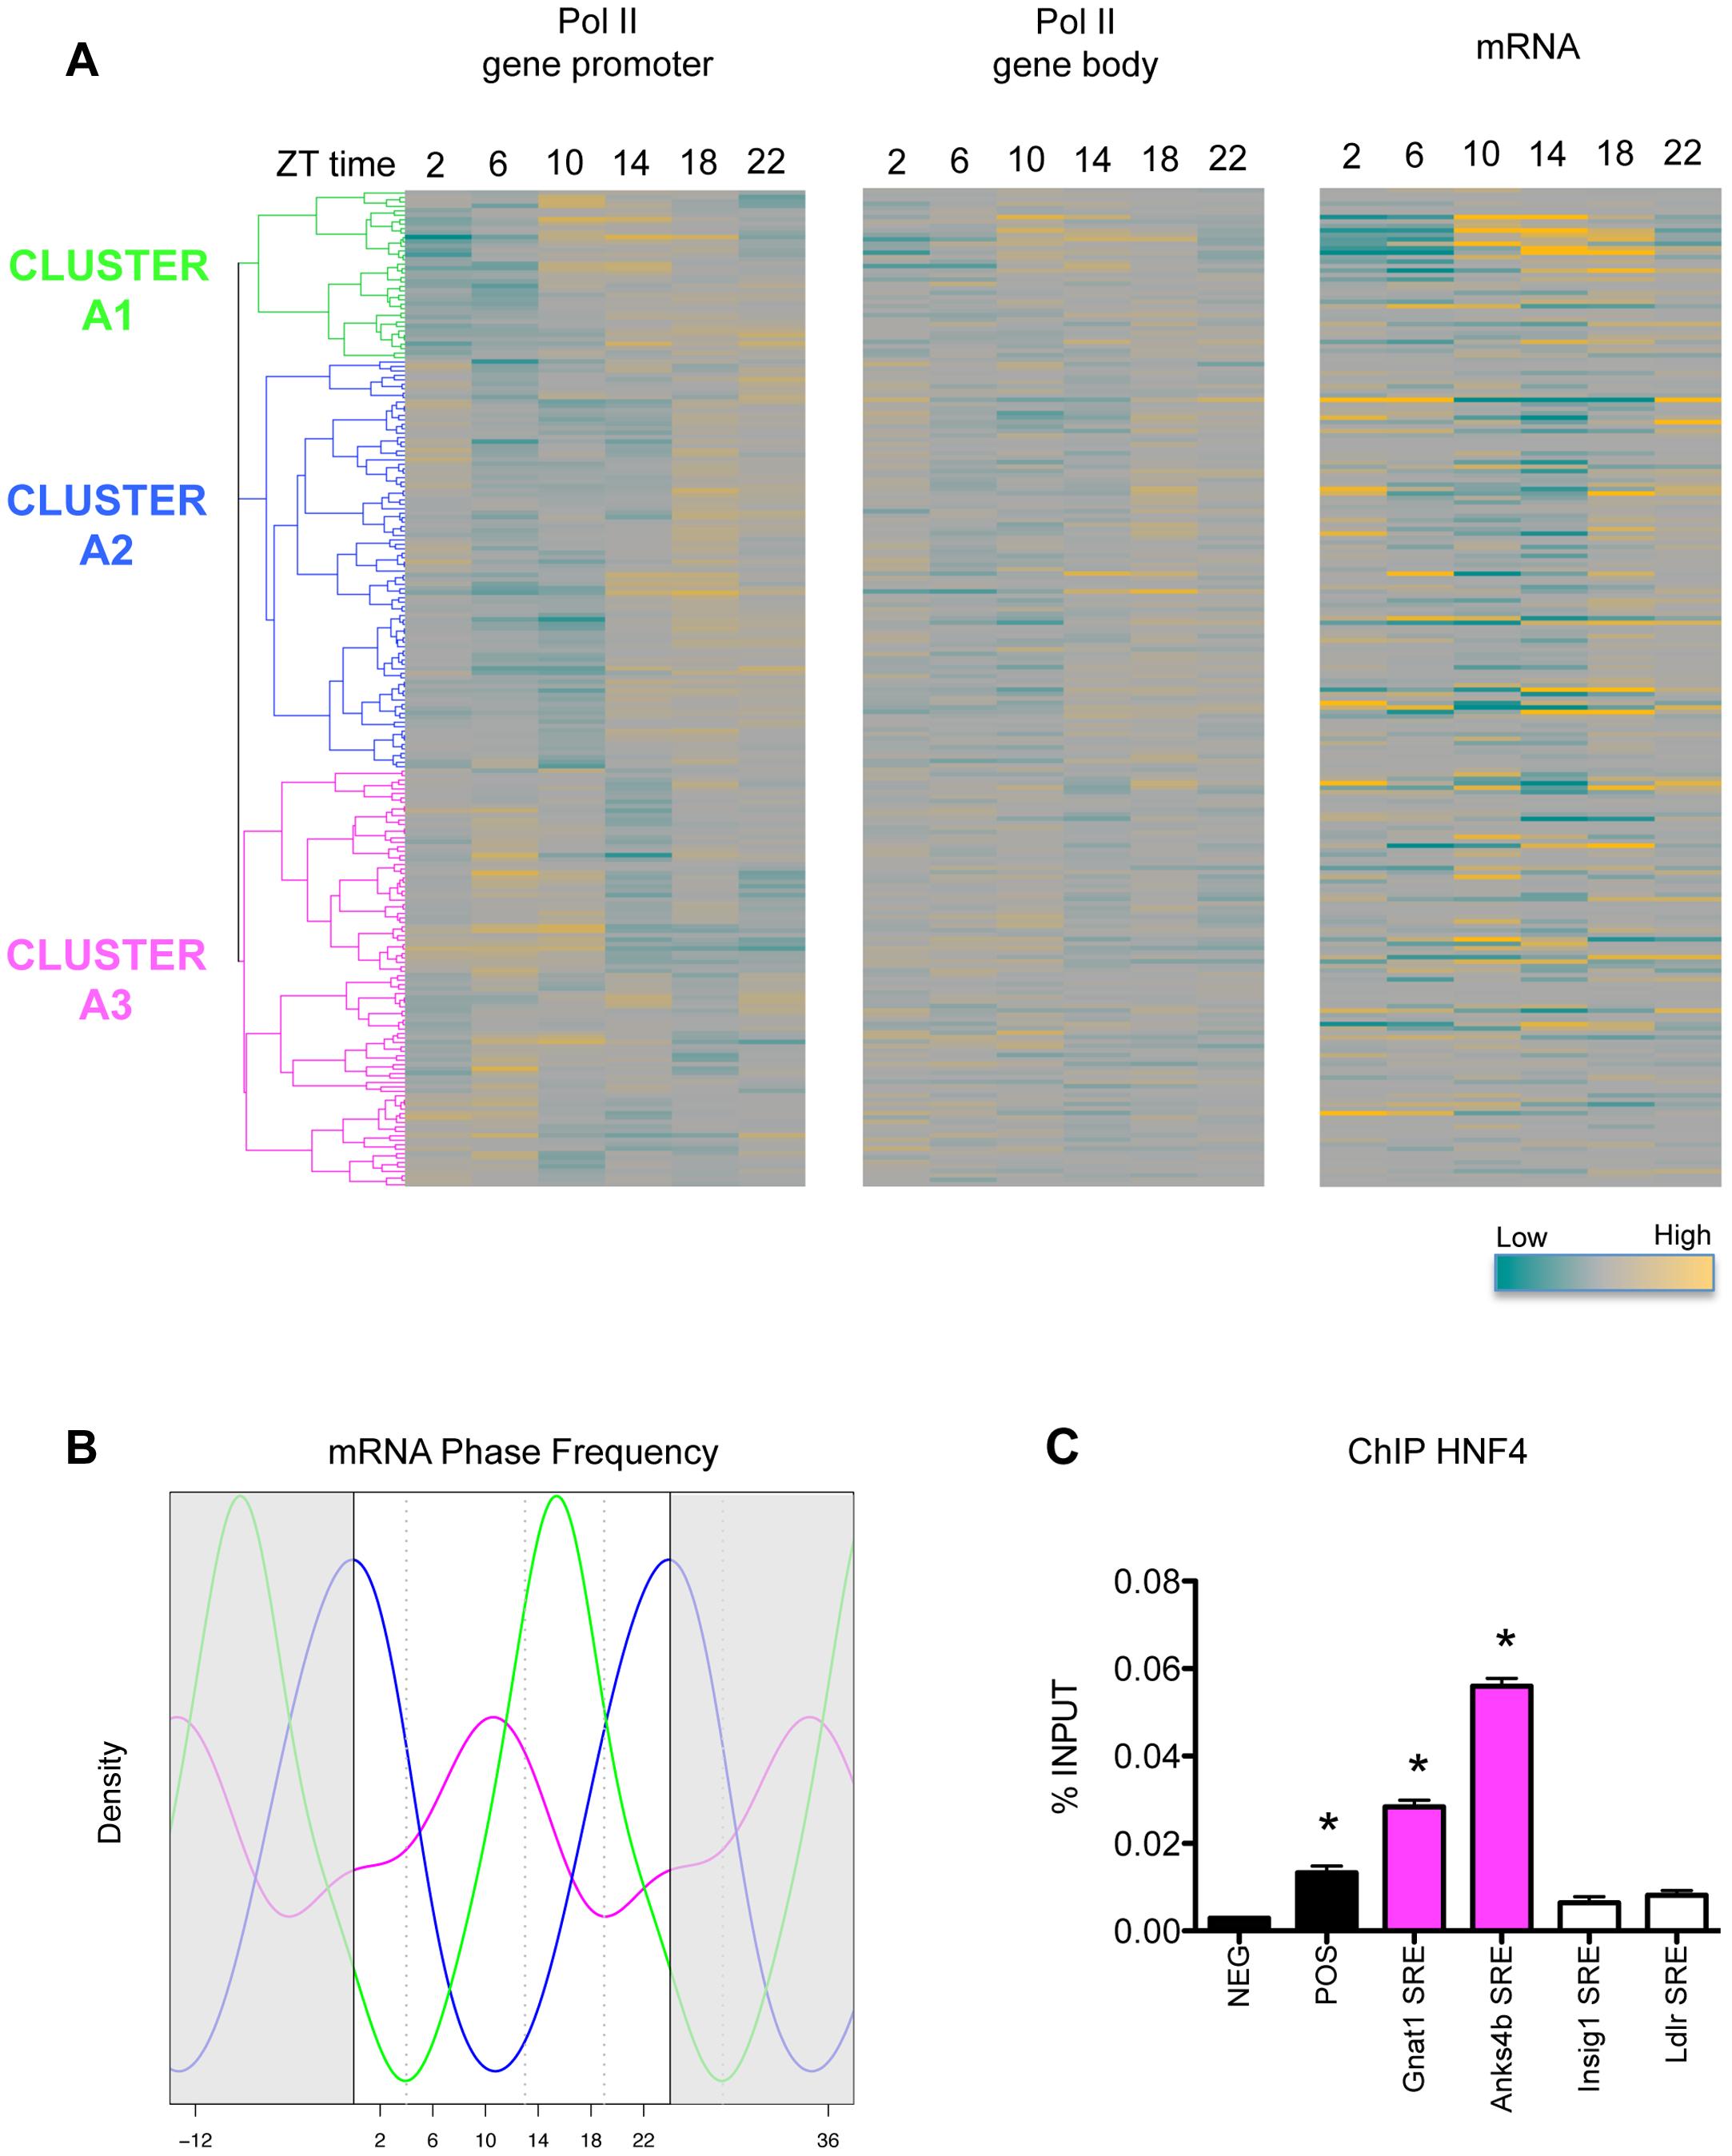 Pol II recruitment on SREBP1 target genes is not always synchronized with SREBP1 binding.